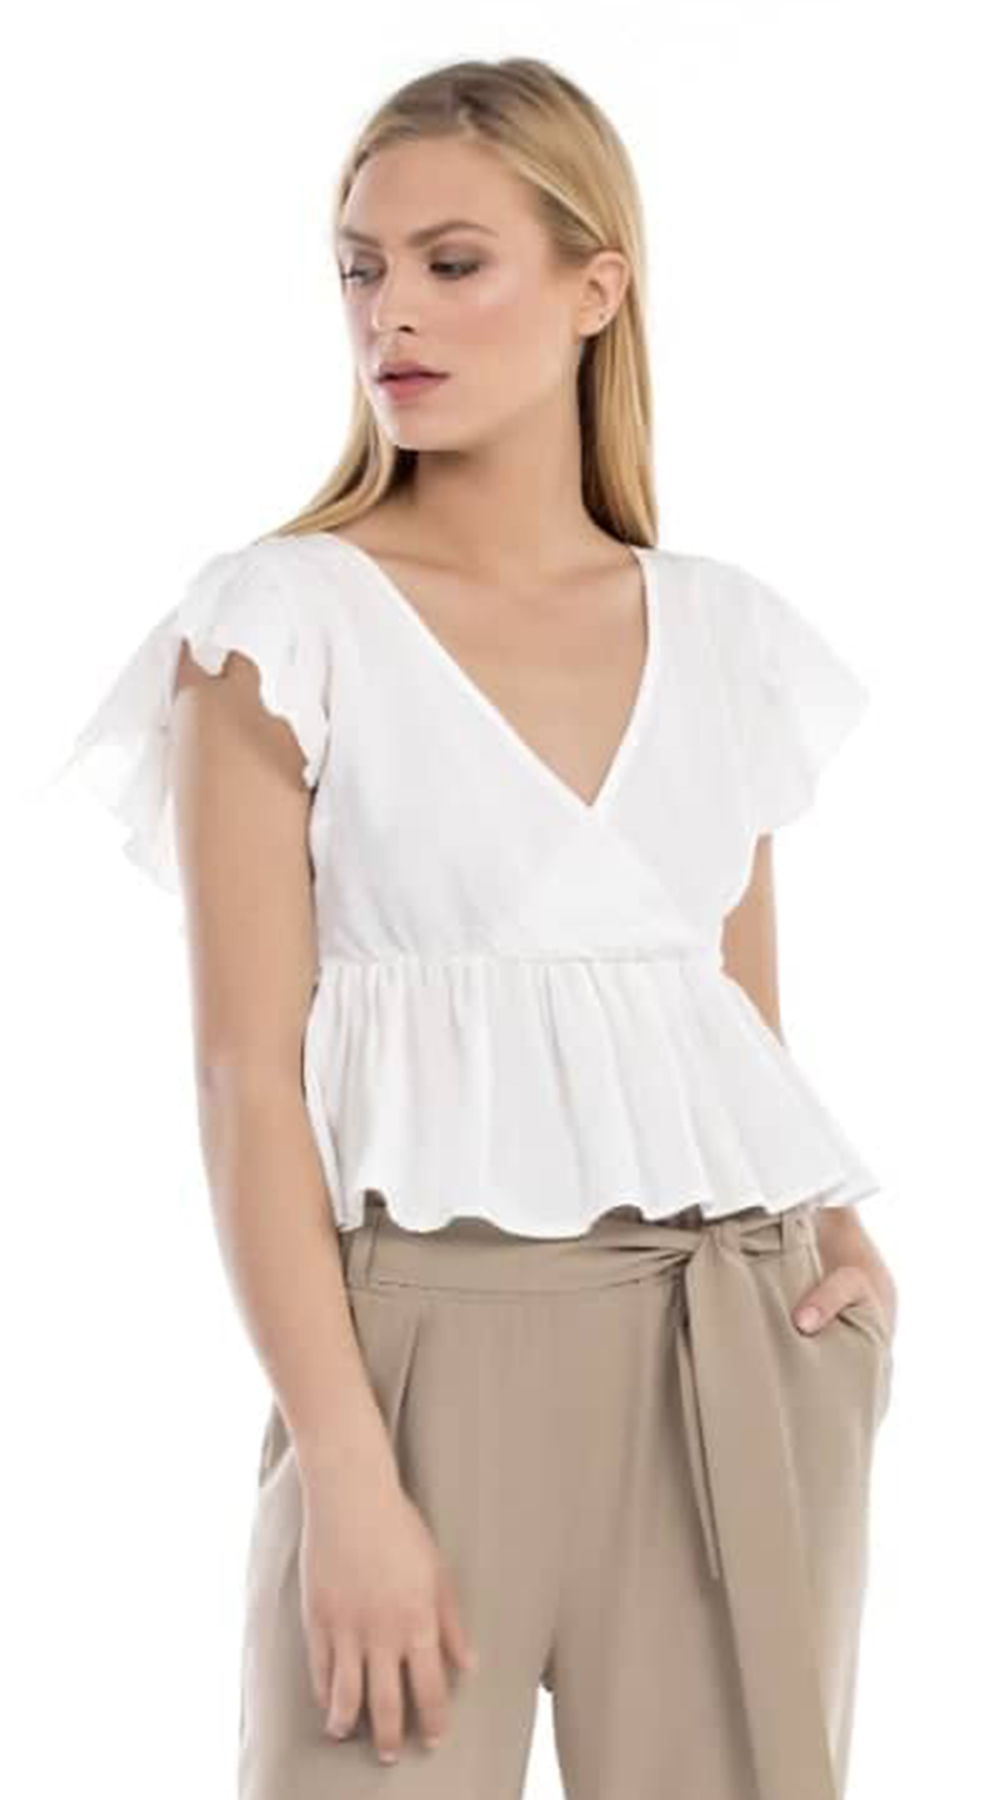 Peplum μπλούζα με ανοιχτή πλάτη Online - ONLINE - S18ON-12643 μπλούζες   t shirts elegant tops